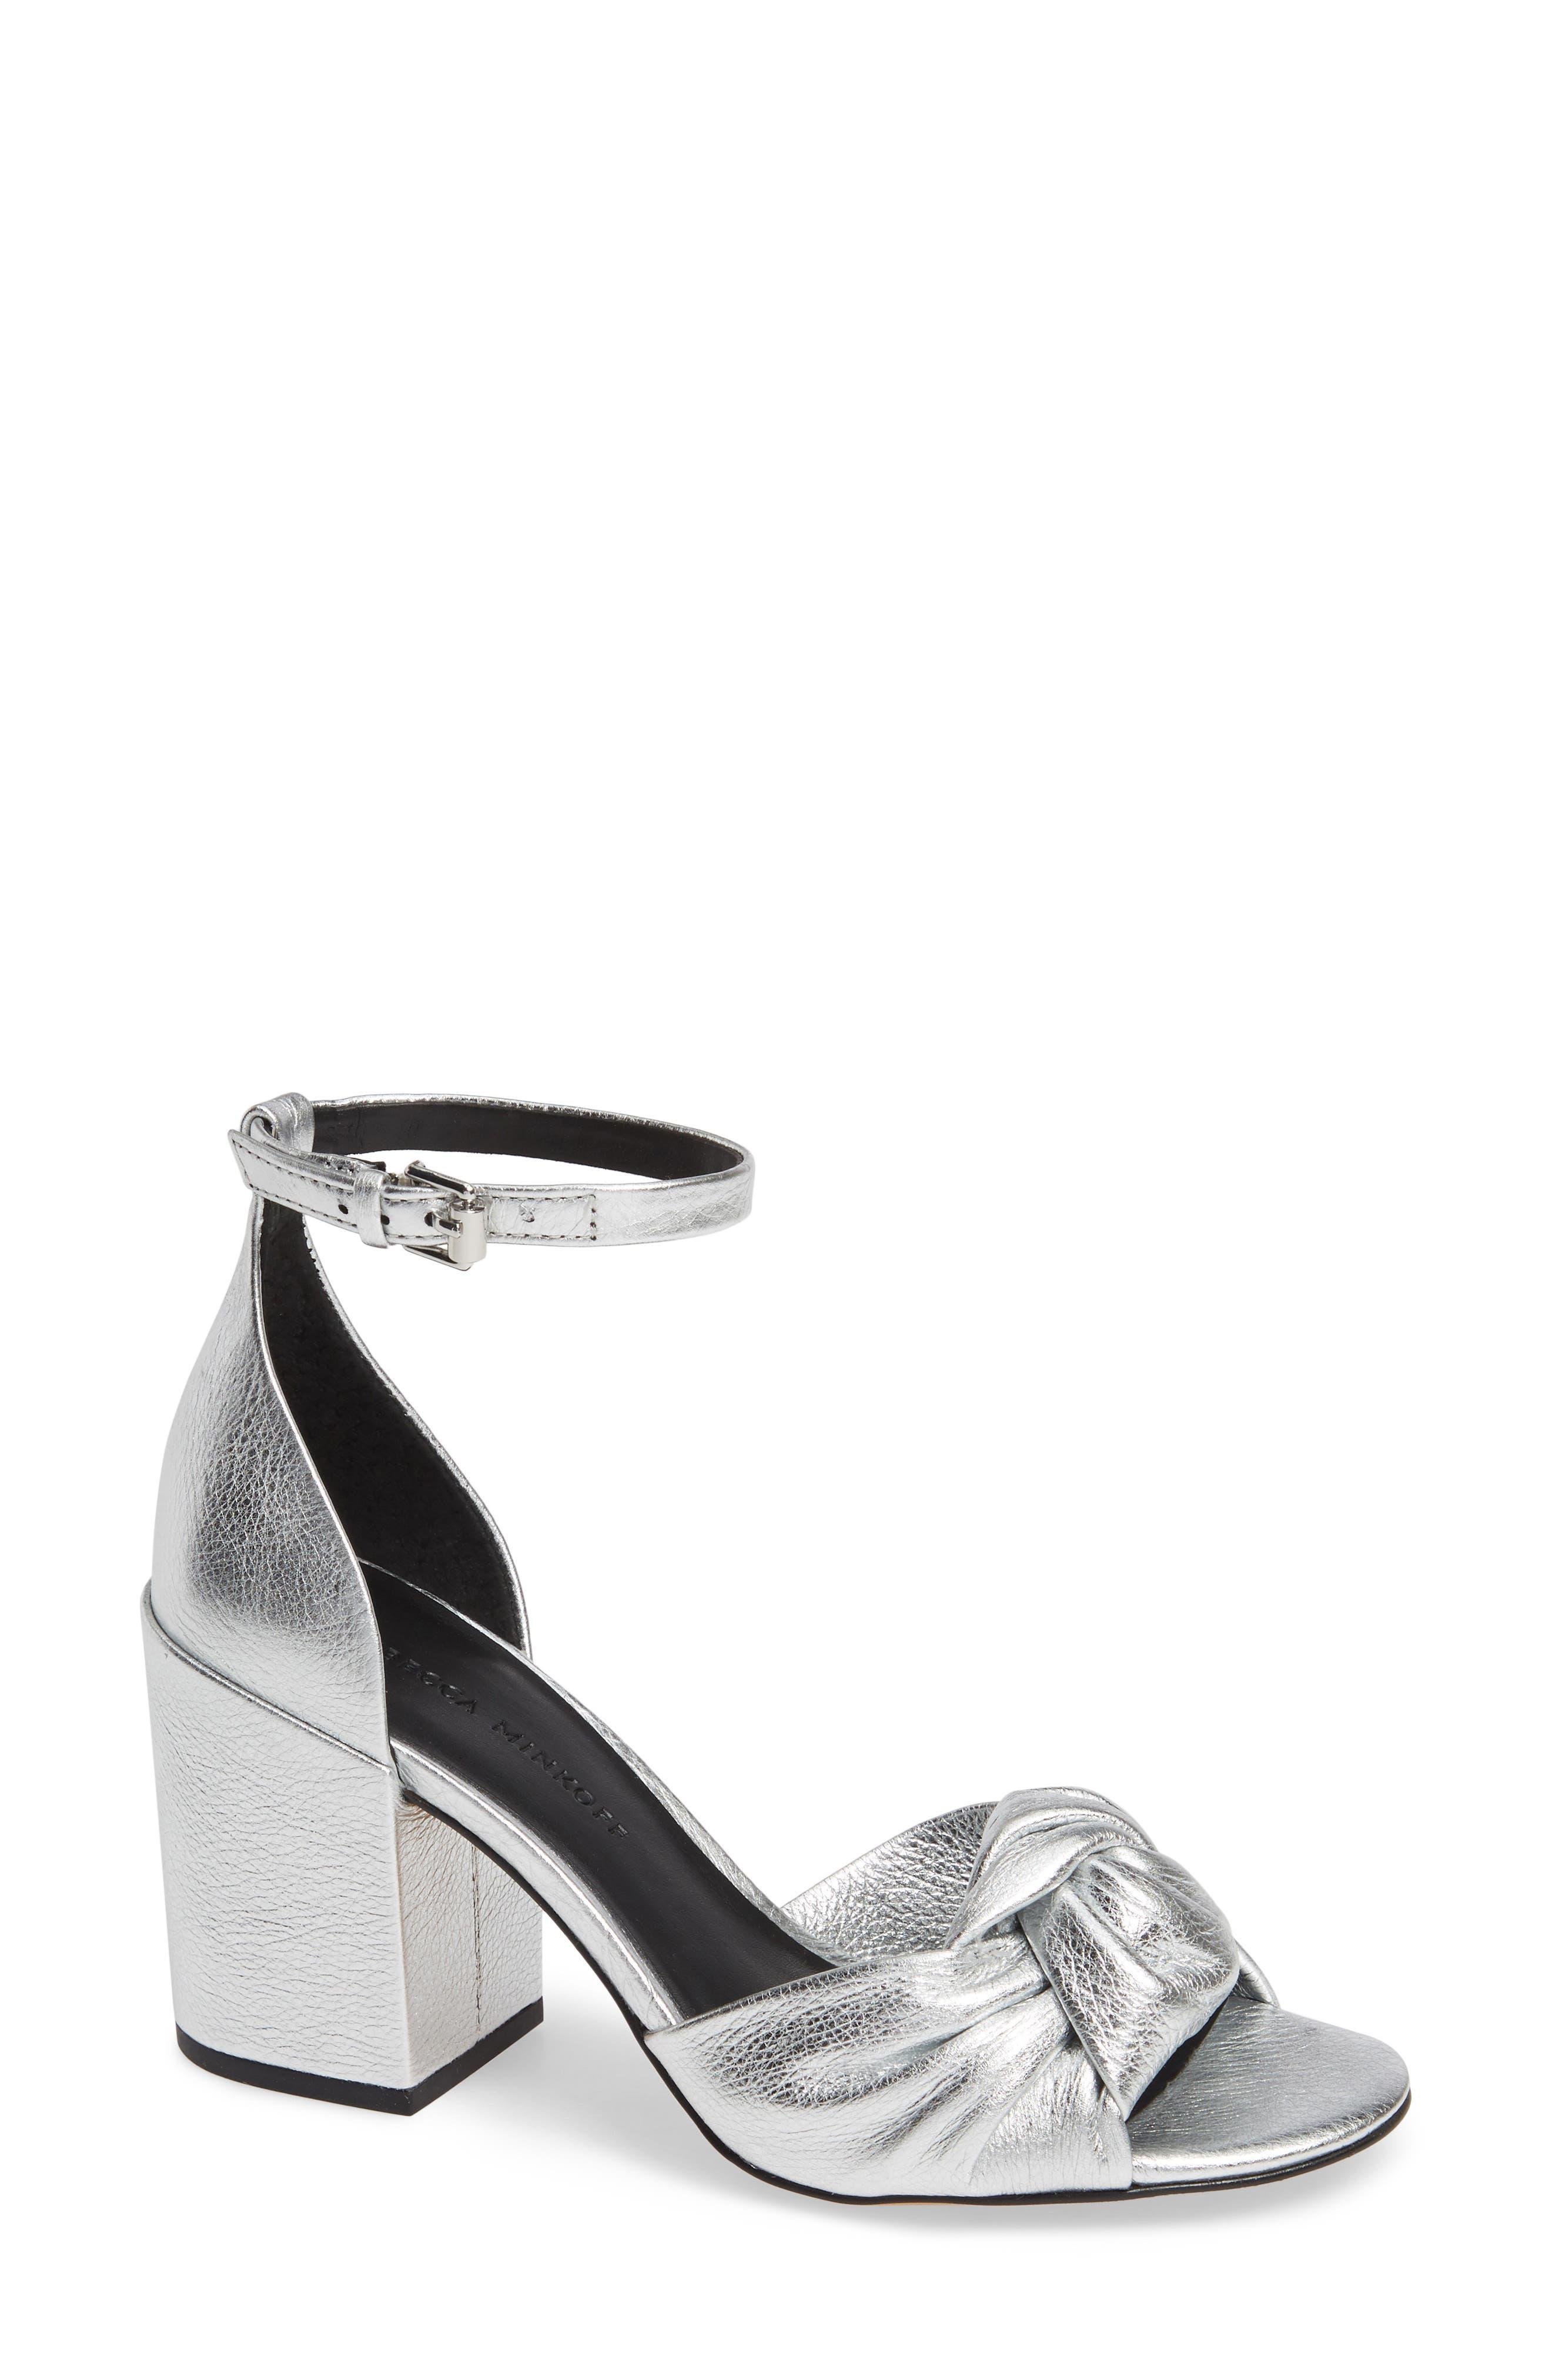 REBECCA MINKOFF Capriana Ankle Strap Sandal, Main, color, SILVER LEATHER